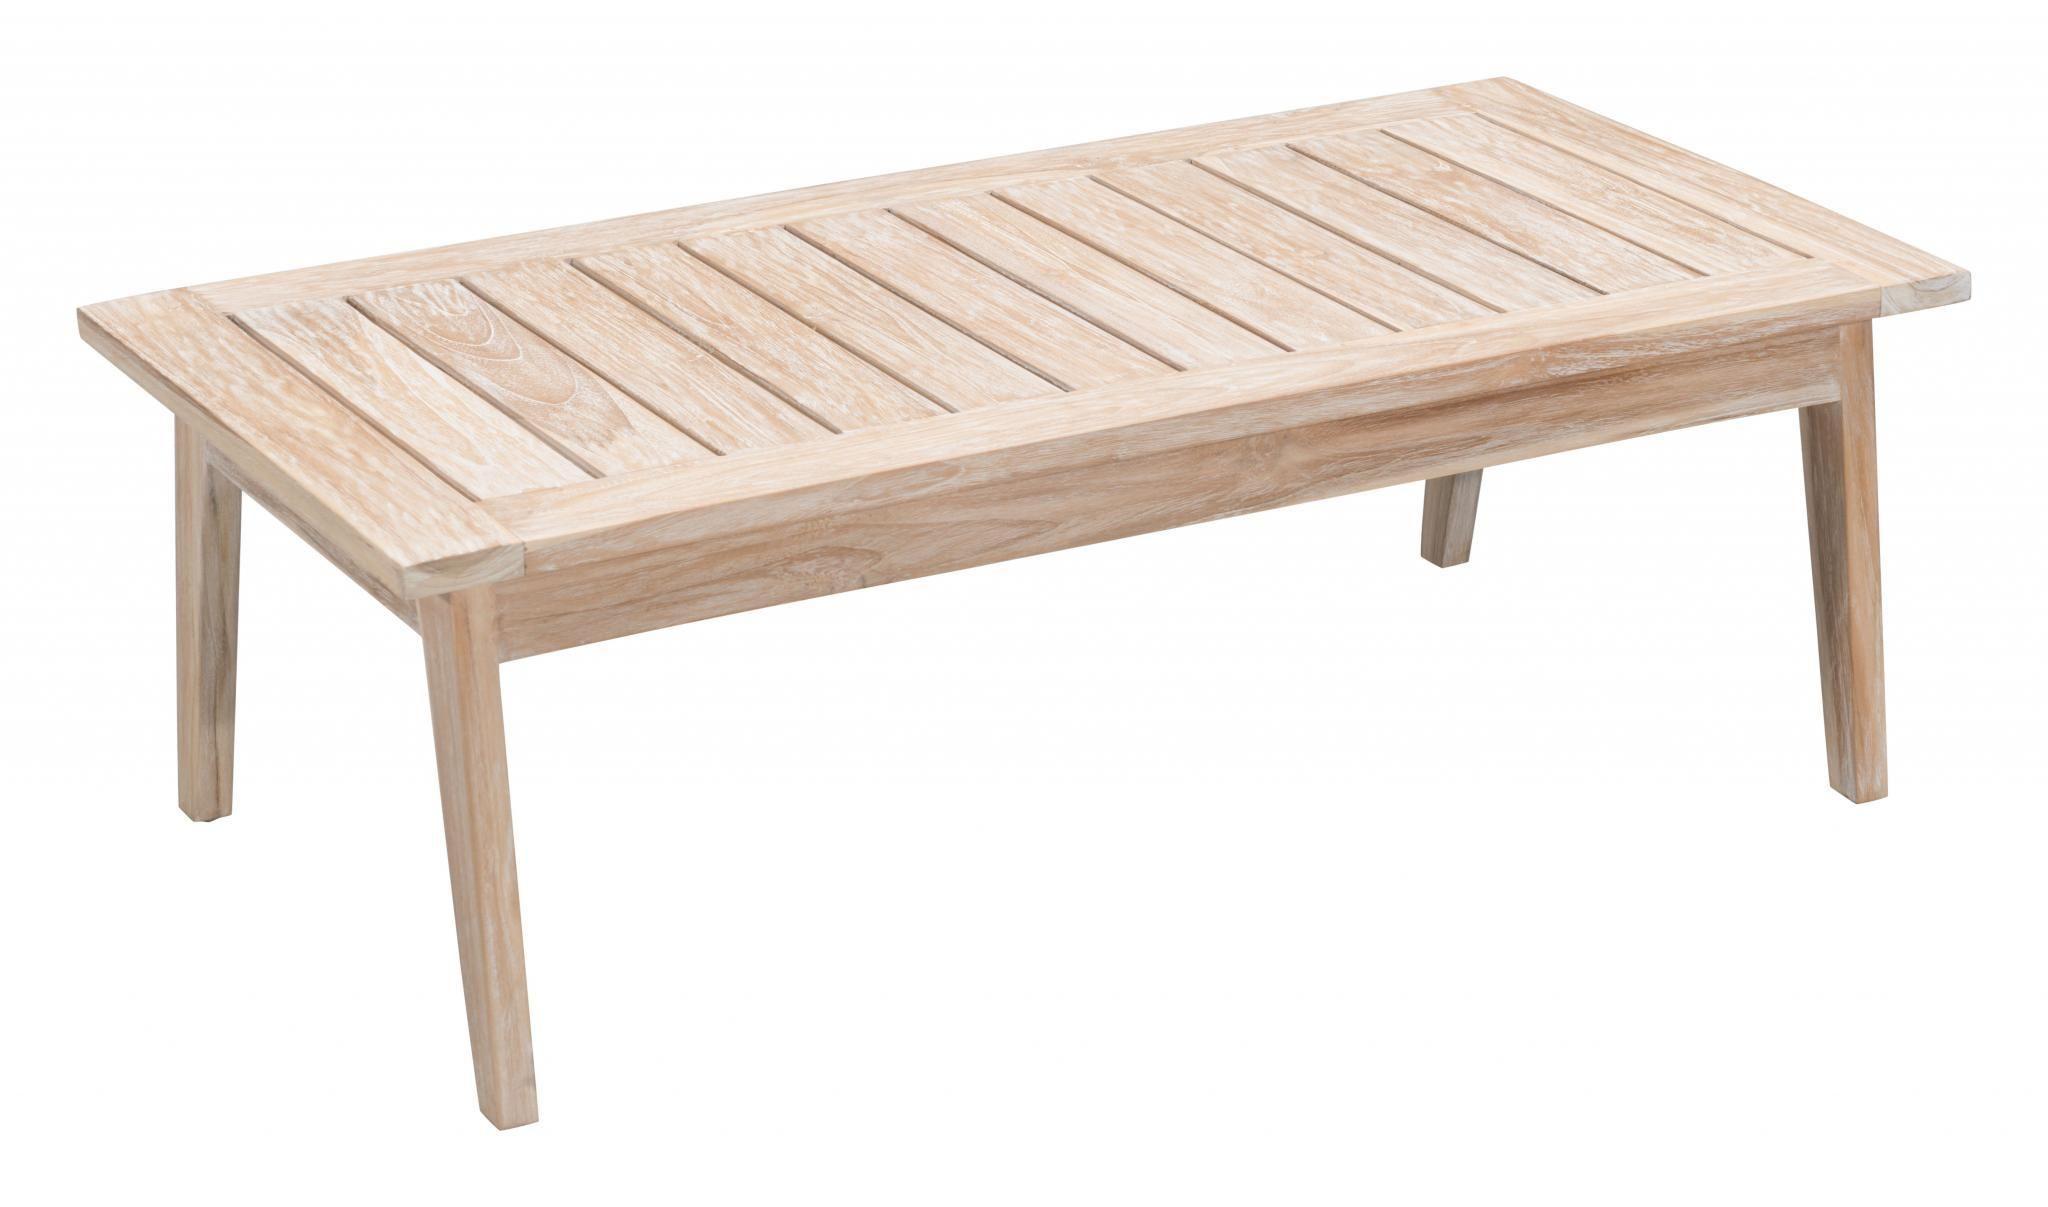 Westport Teak Outdoor Furniture Sale Online Furniture Store